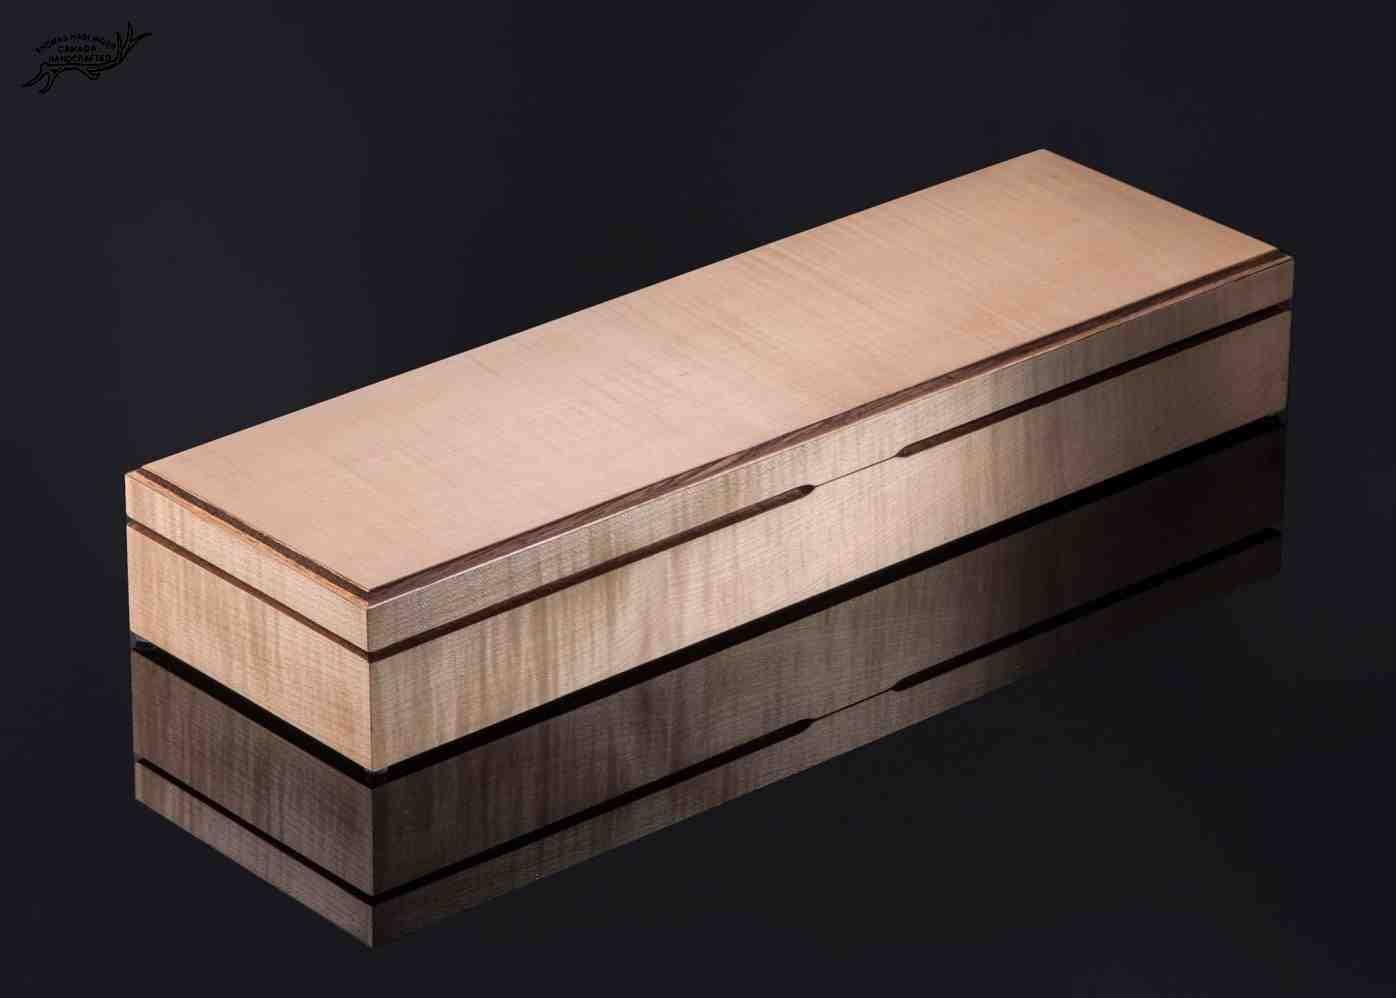 Raindrop Damascus and Premium Curly Koa Carving Set in presentation box, closed